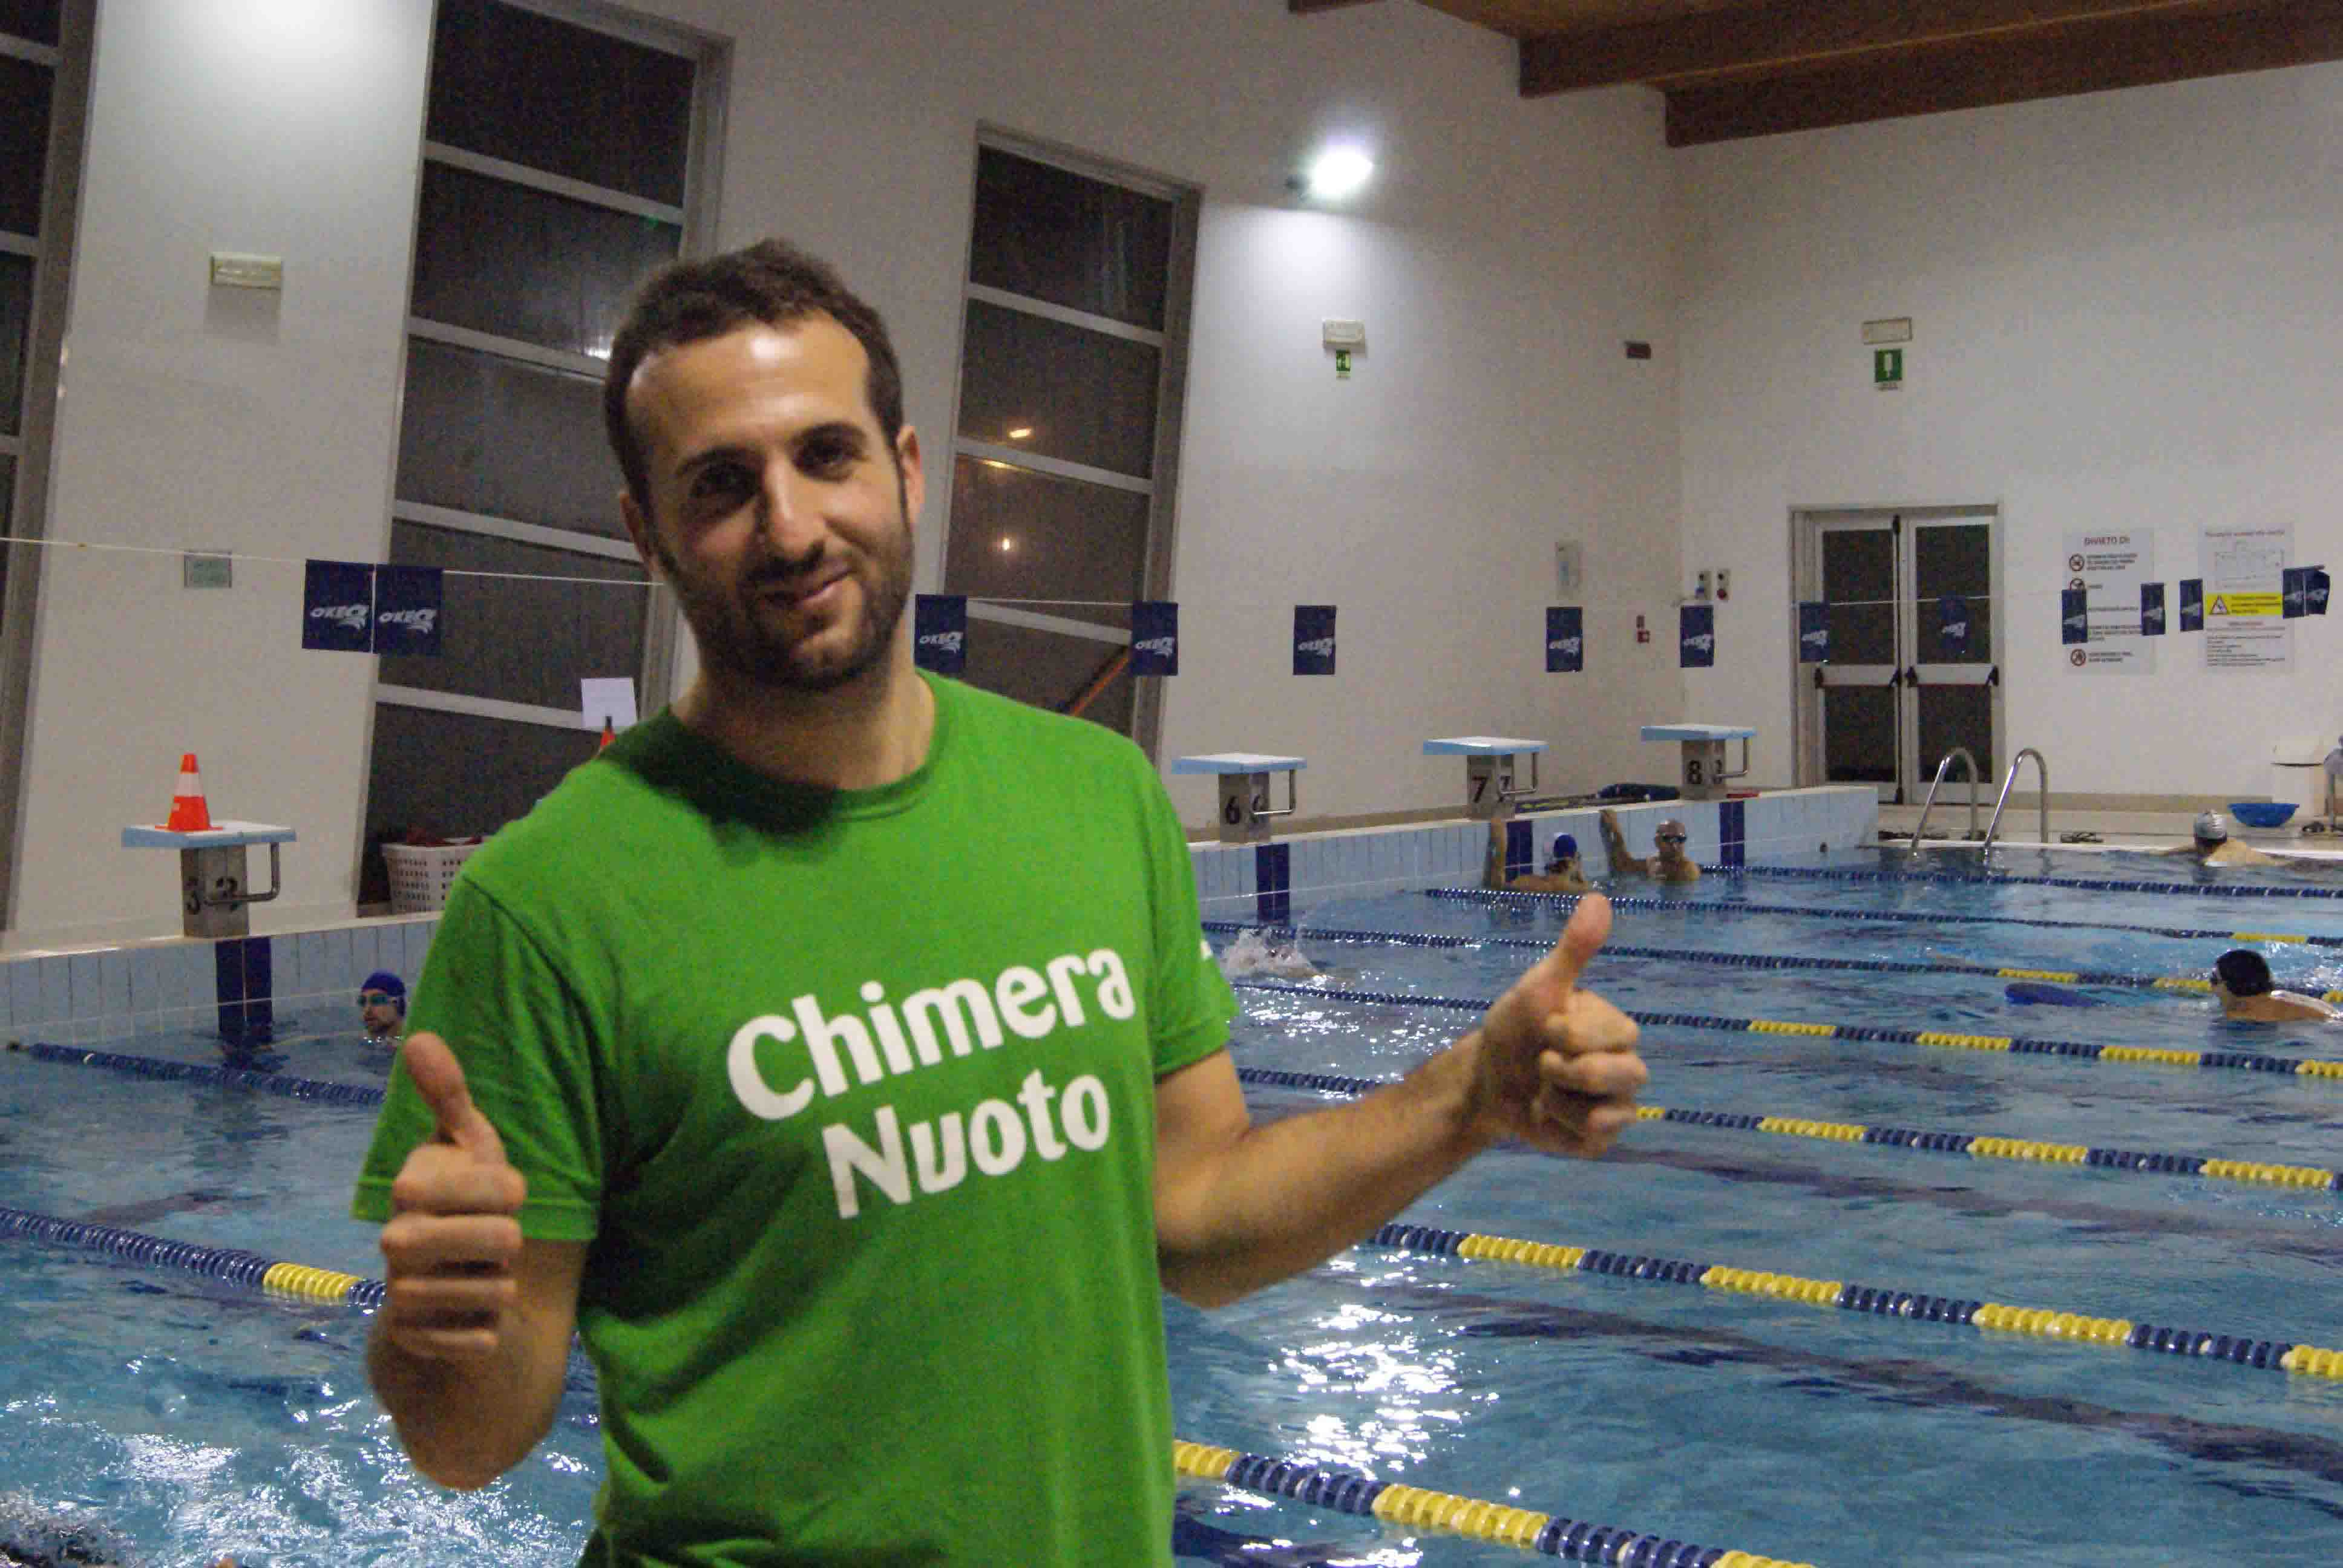 Chimera Nuoto - Marco Magara (1)